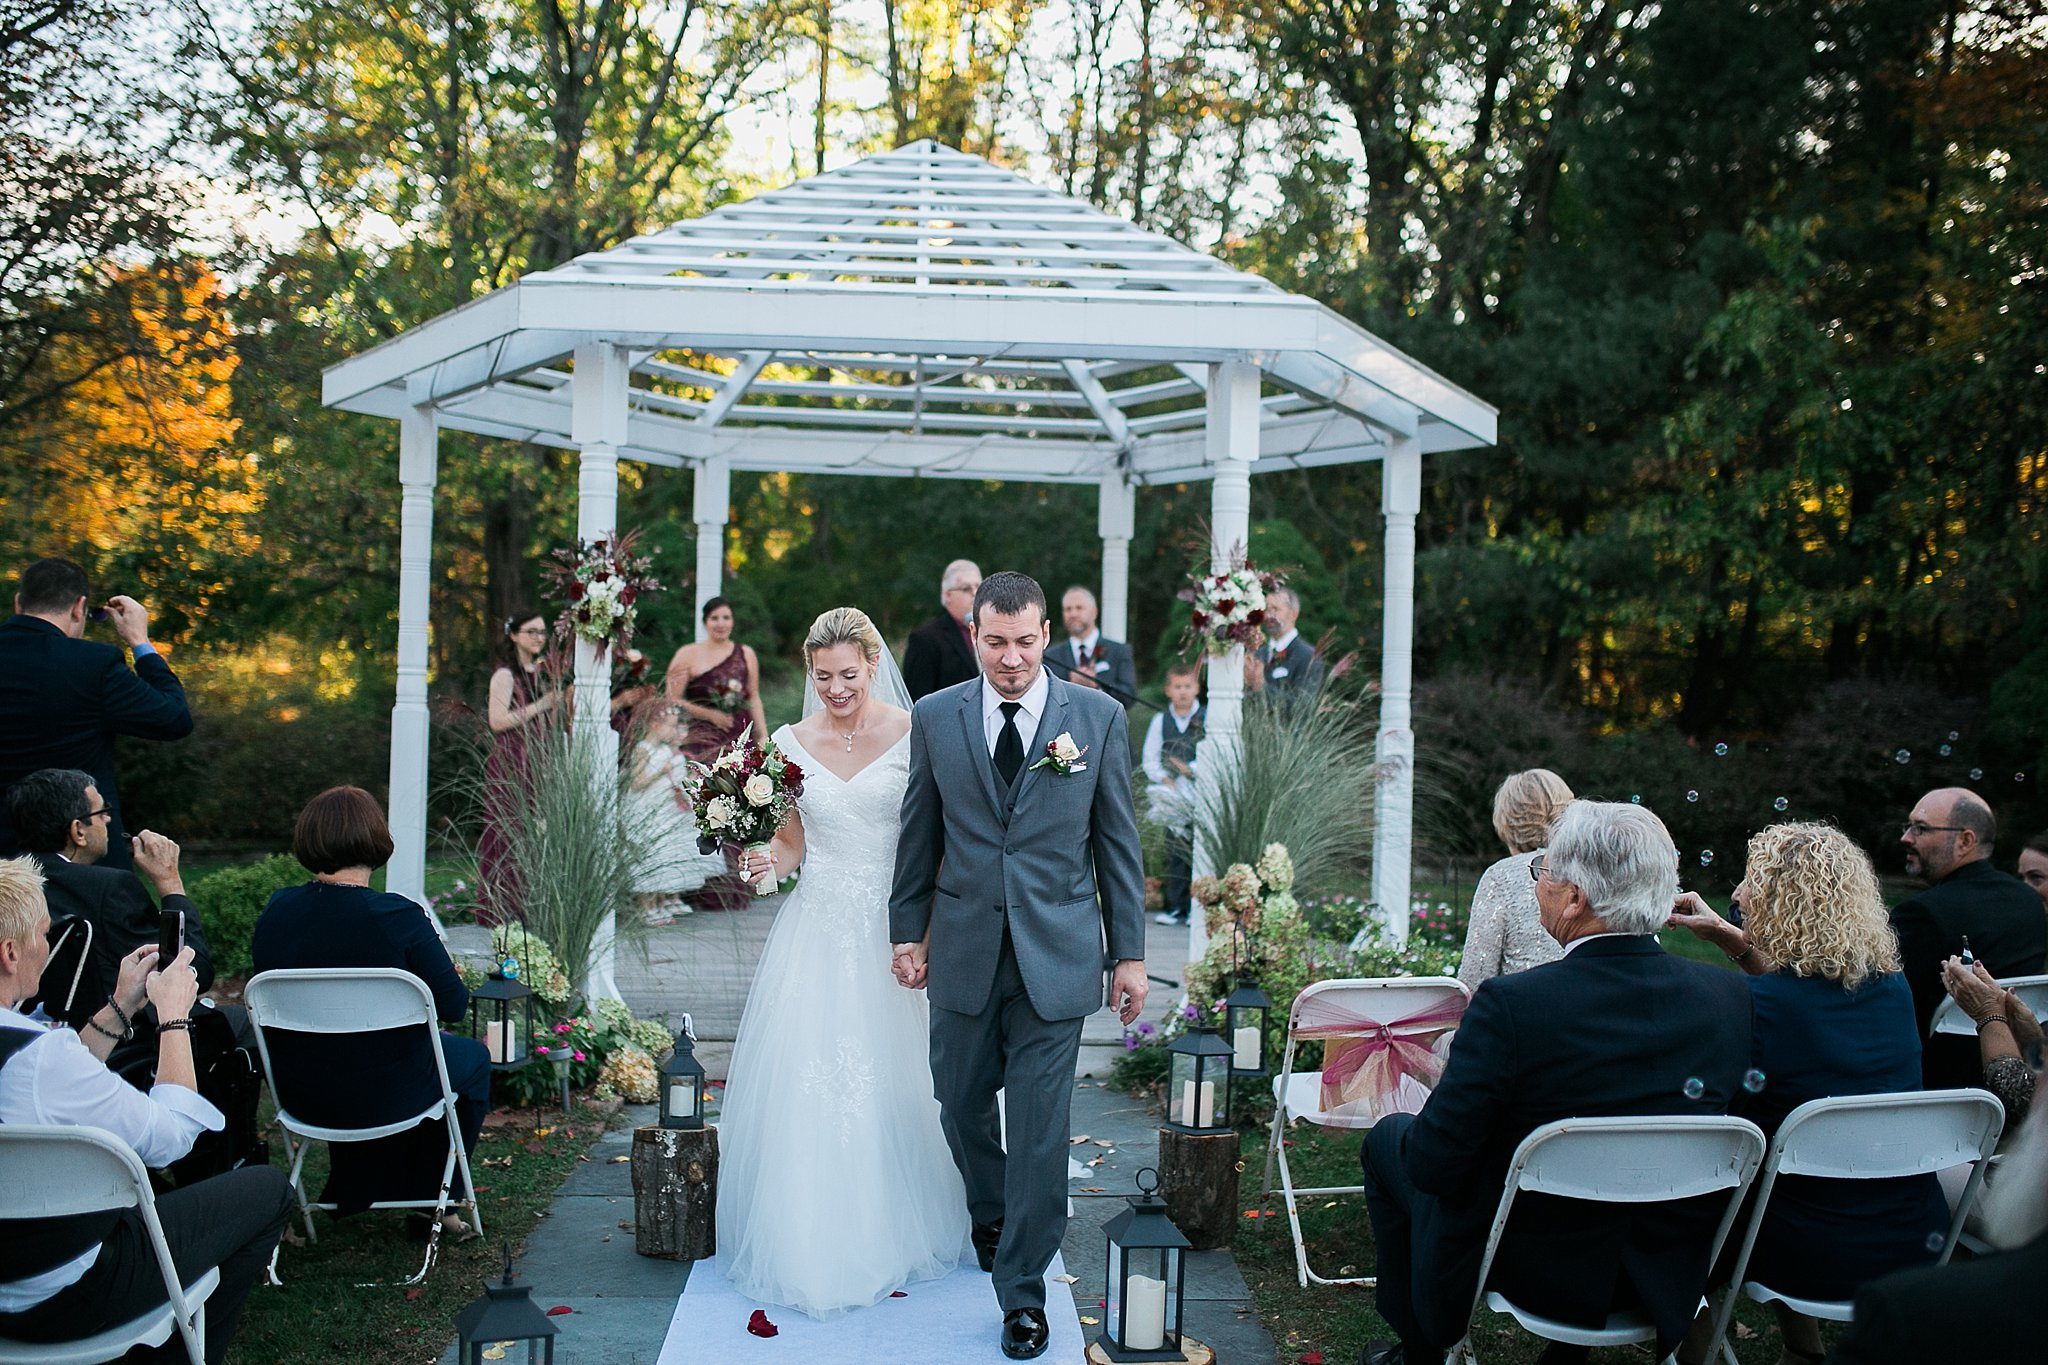 New Windsor New York Hudson Valley New York Wedding Photographer 49.jpg